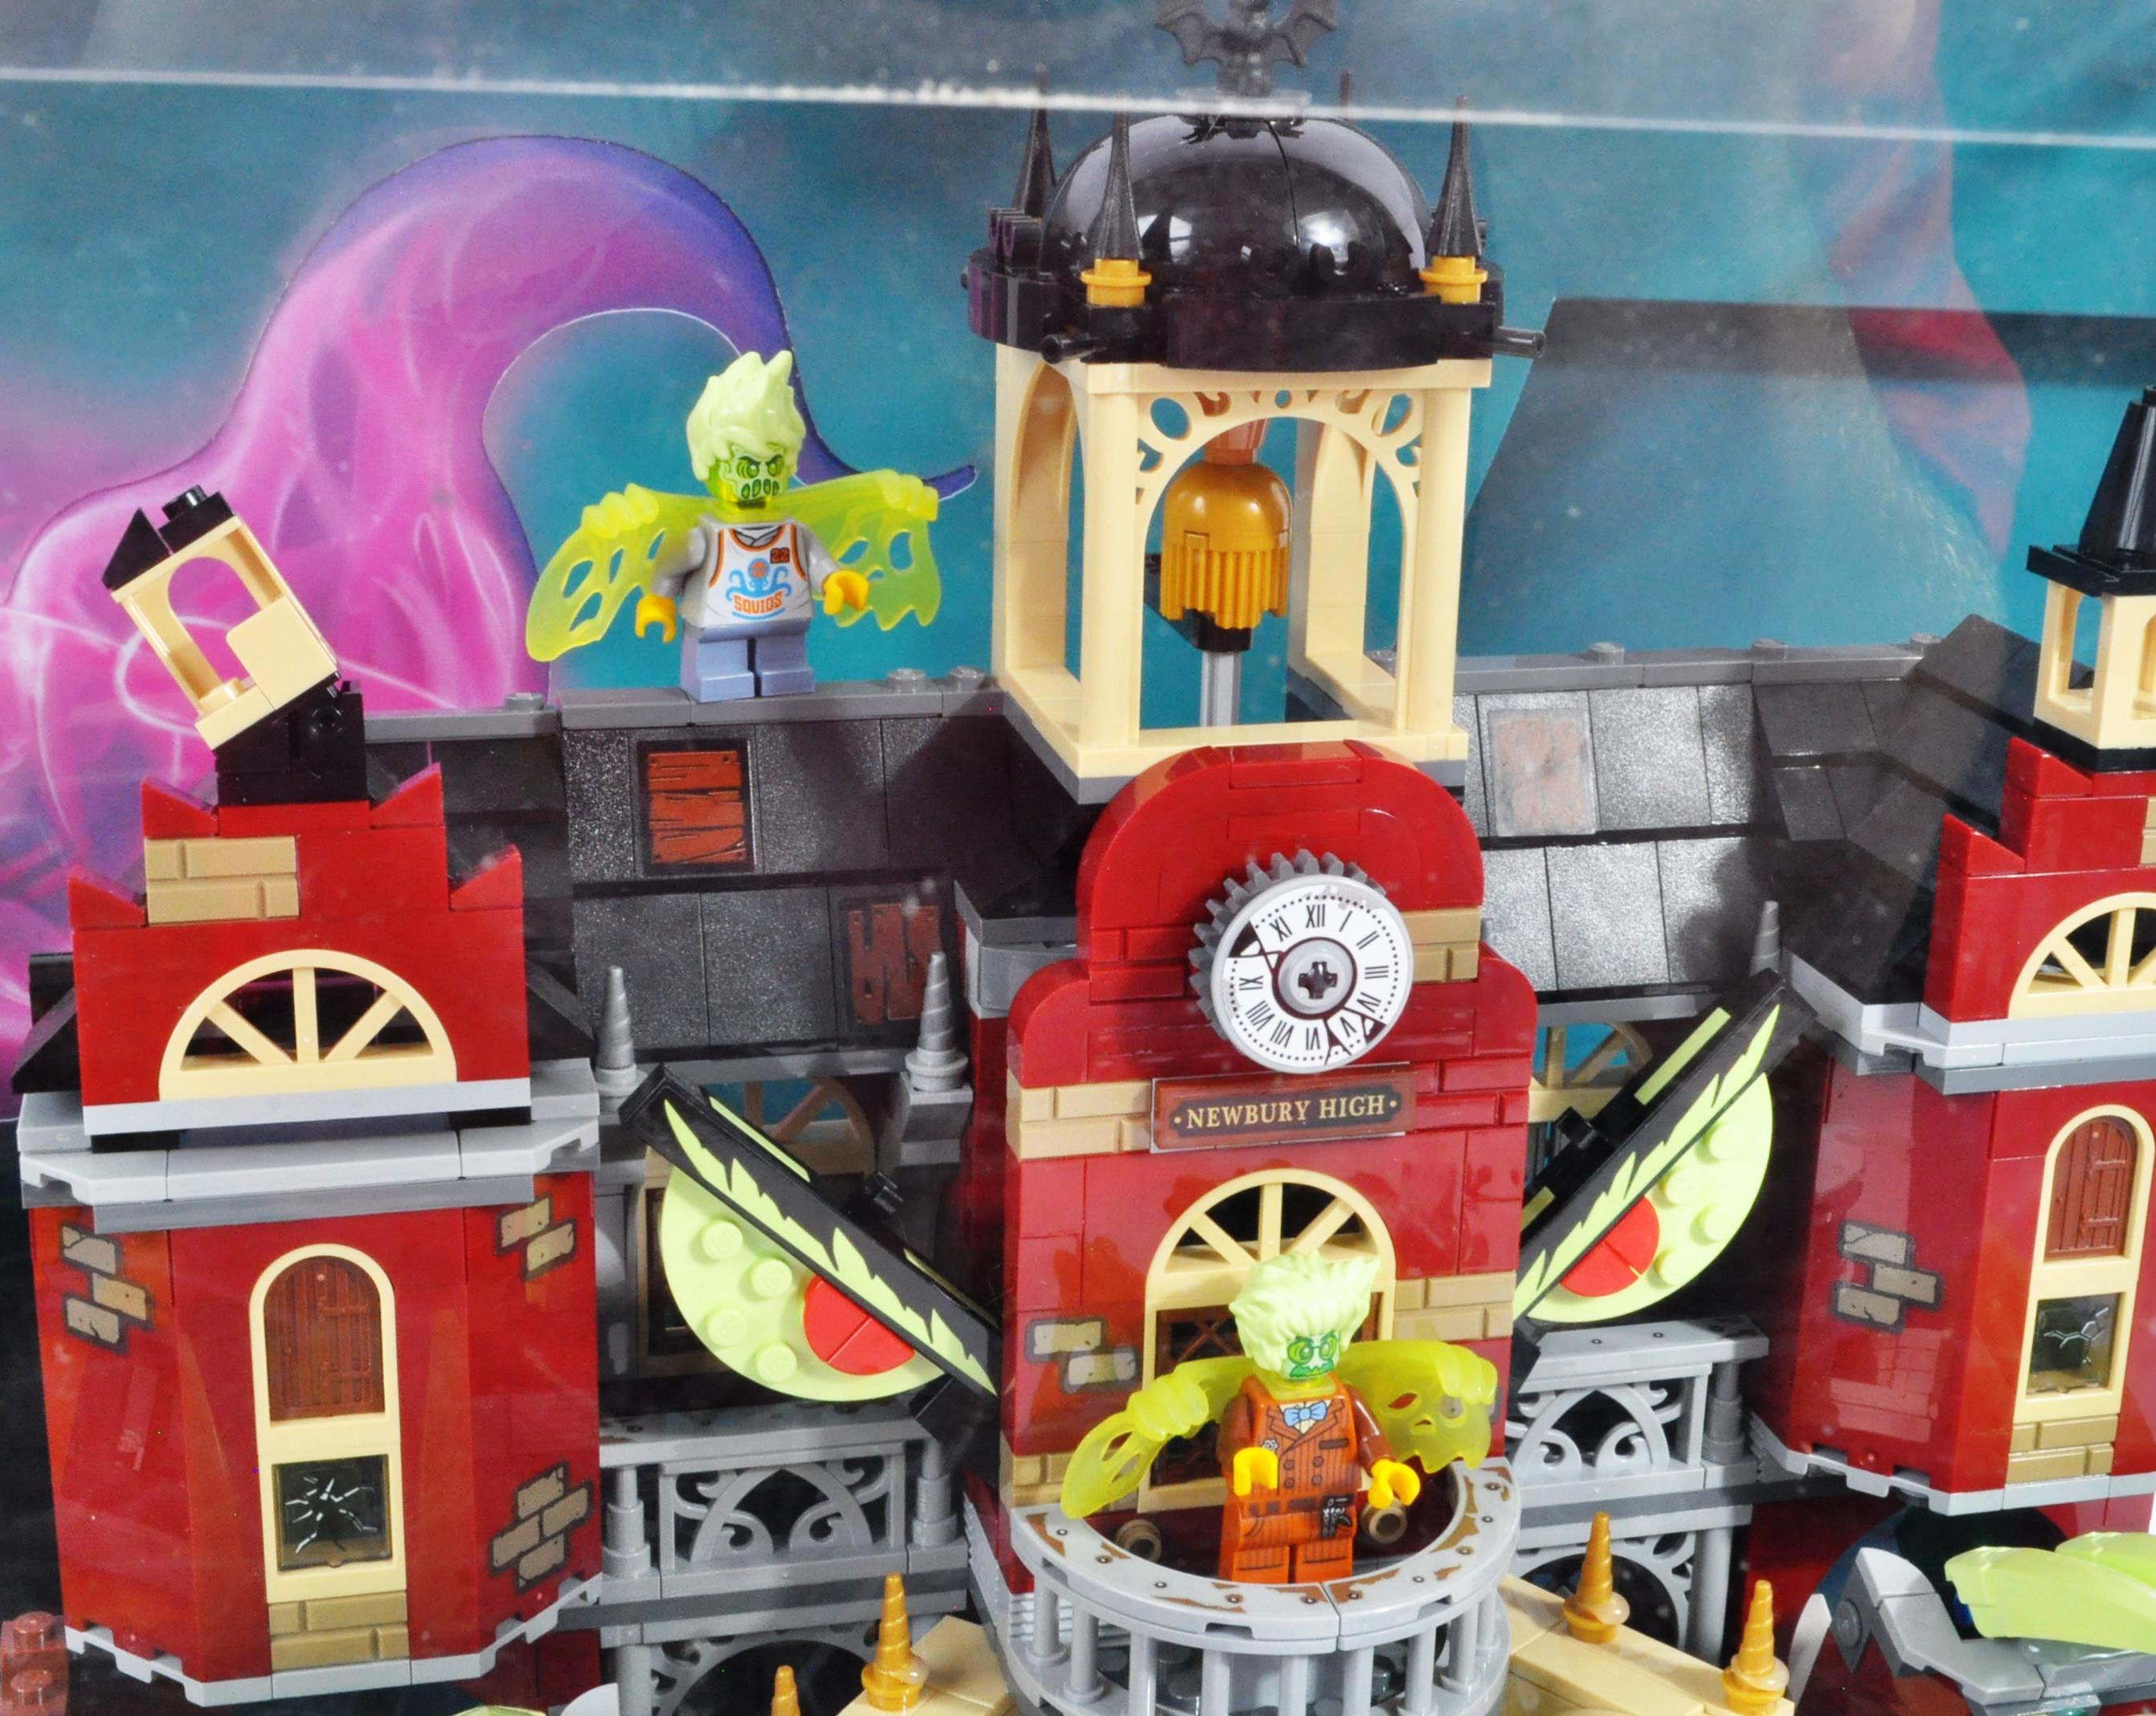 LEGO - HIDDEN SIDE - ORIGINAL IN STORE SHOP DISPLAY CABINET - Image 4 of 8